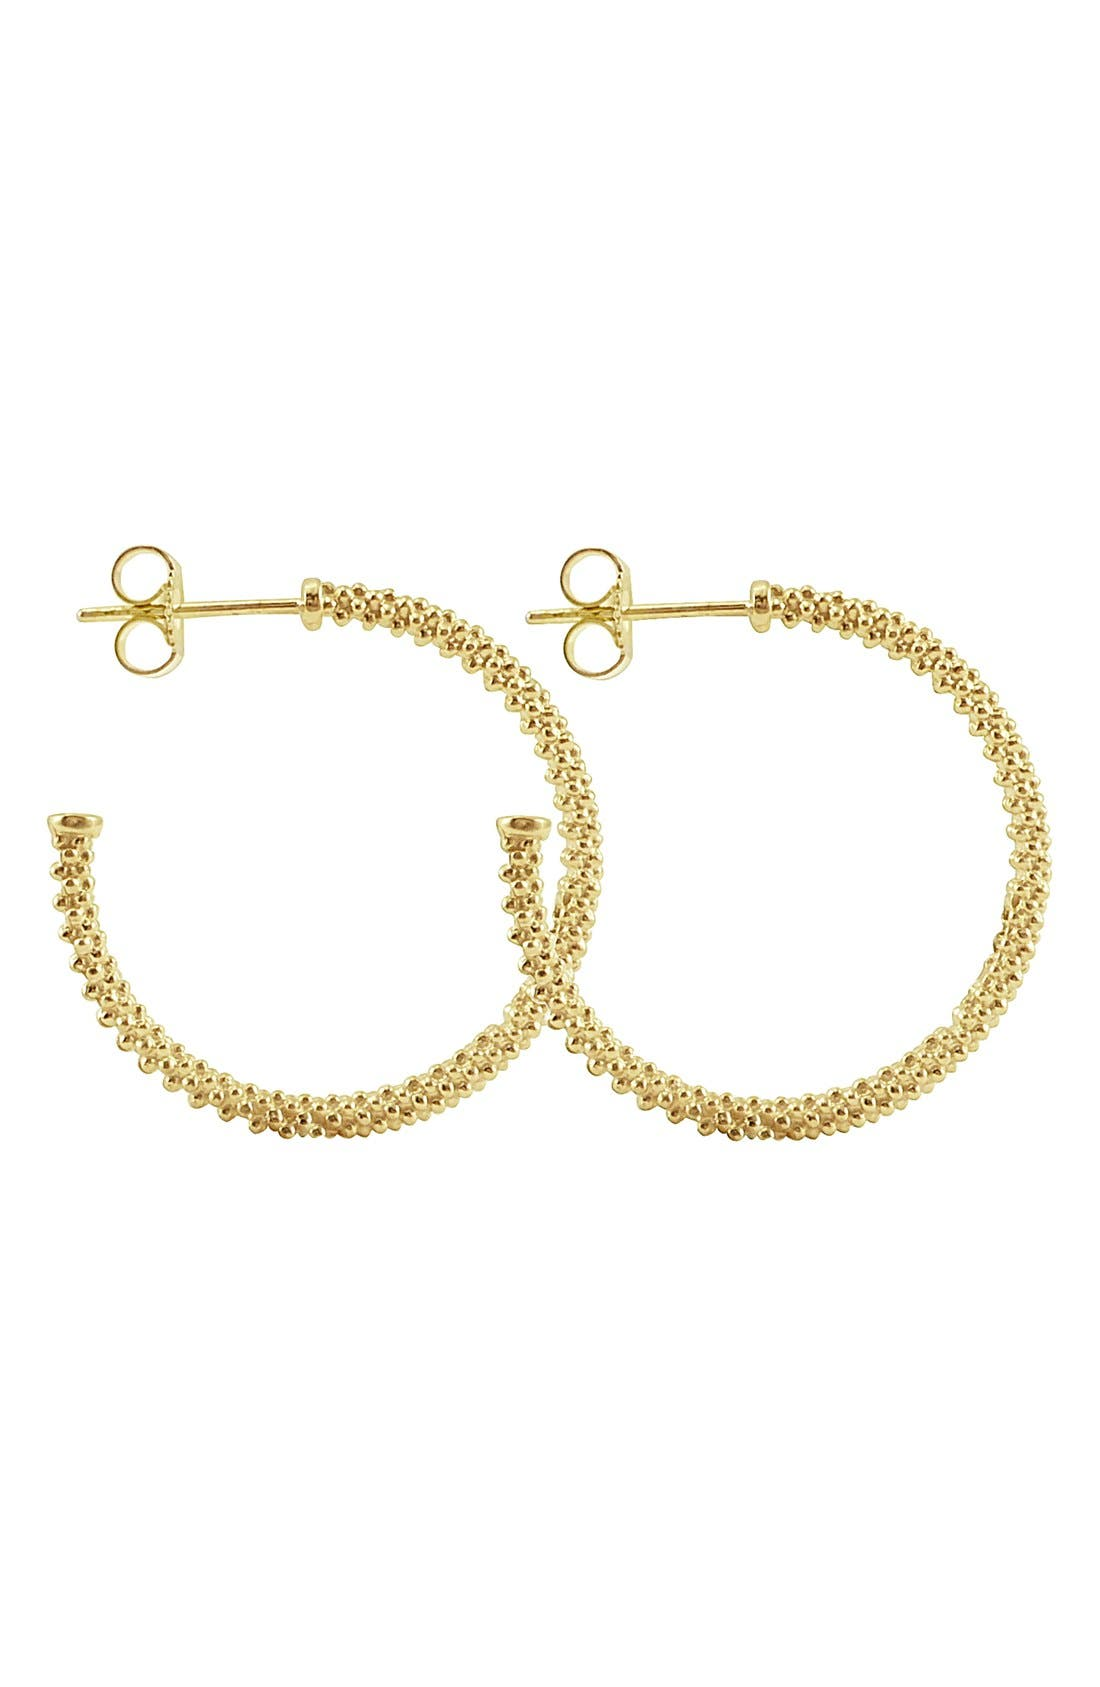 LAGOS Caviar Gold Hoop Earrings